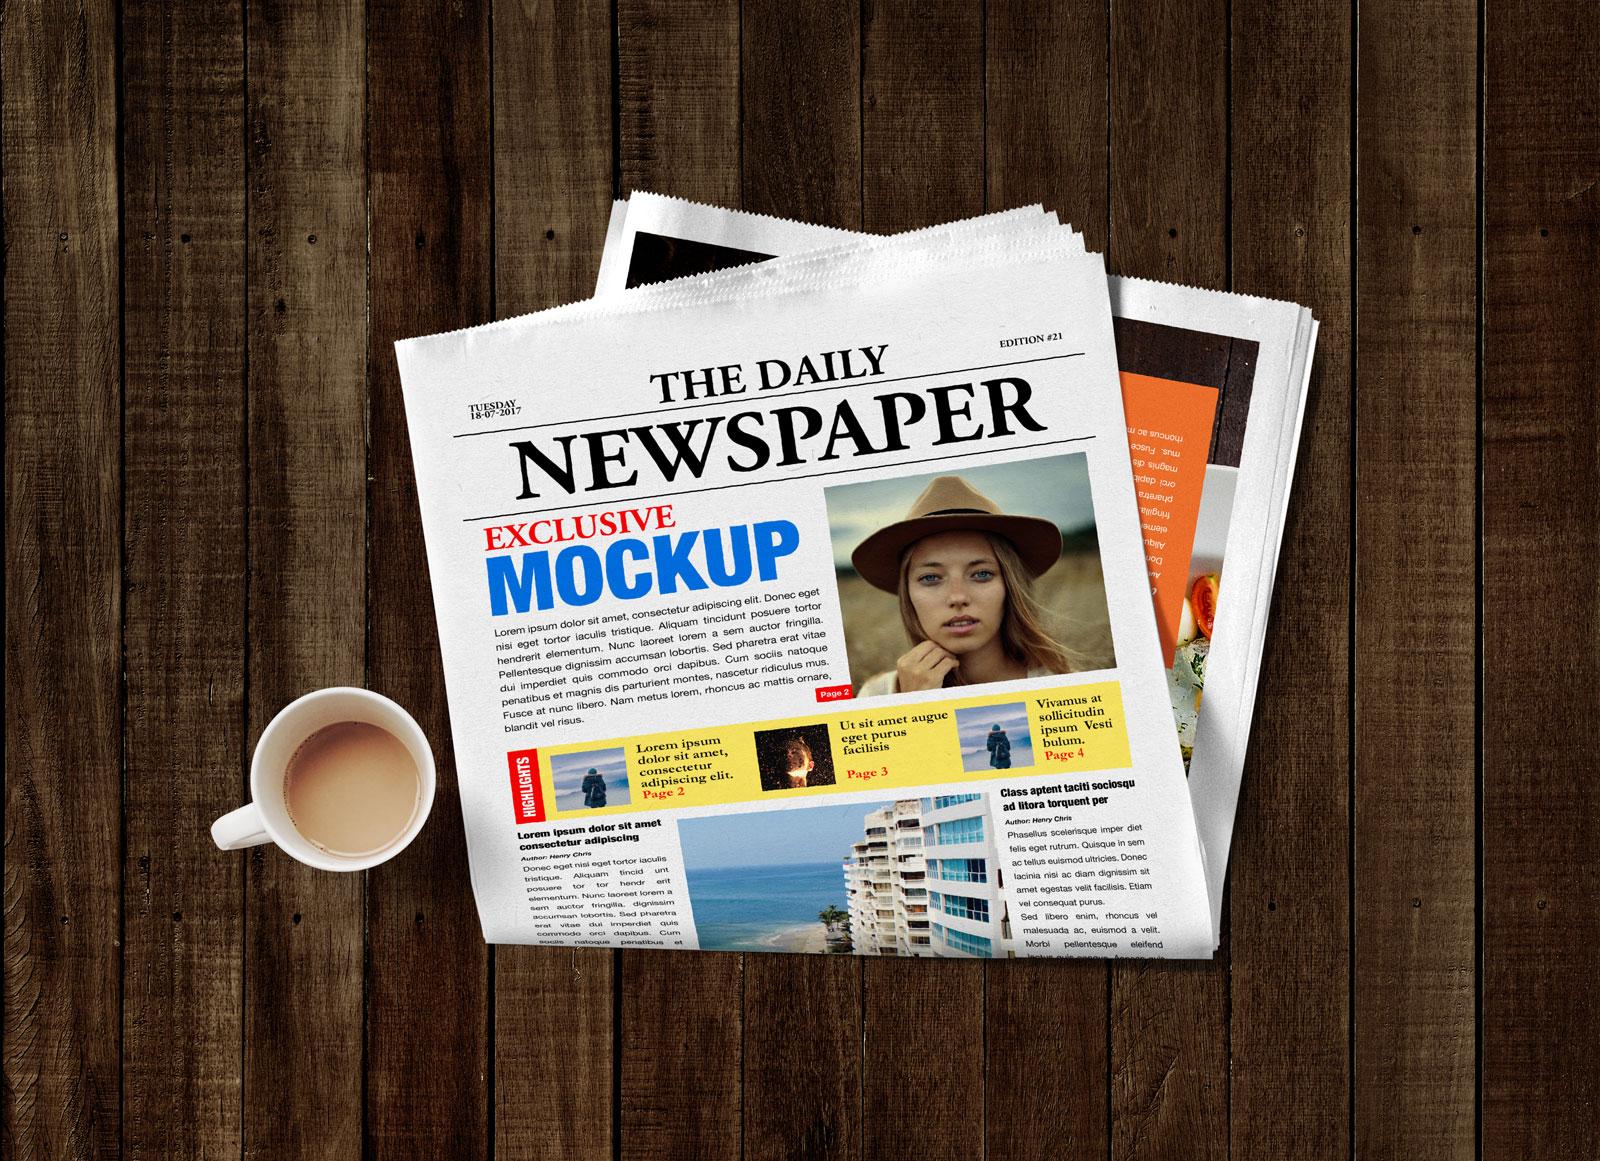 Free-Daily-Newspaper-Print-AD-Mockup-PSD